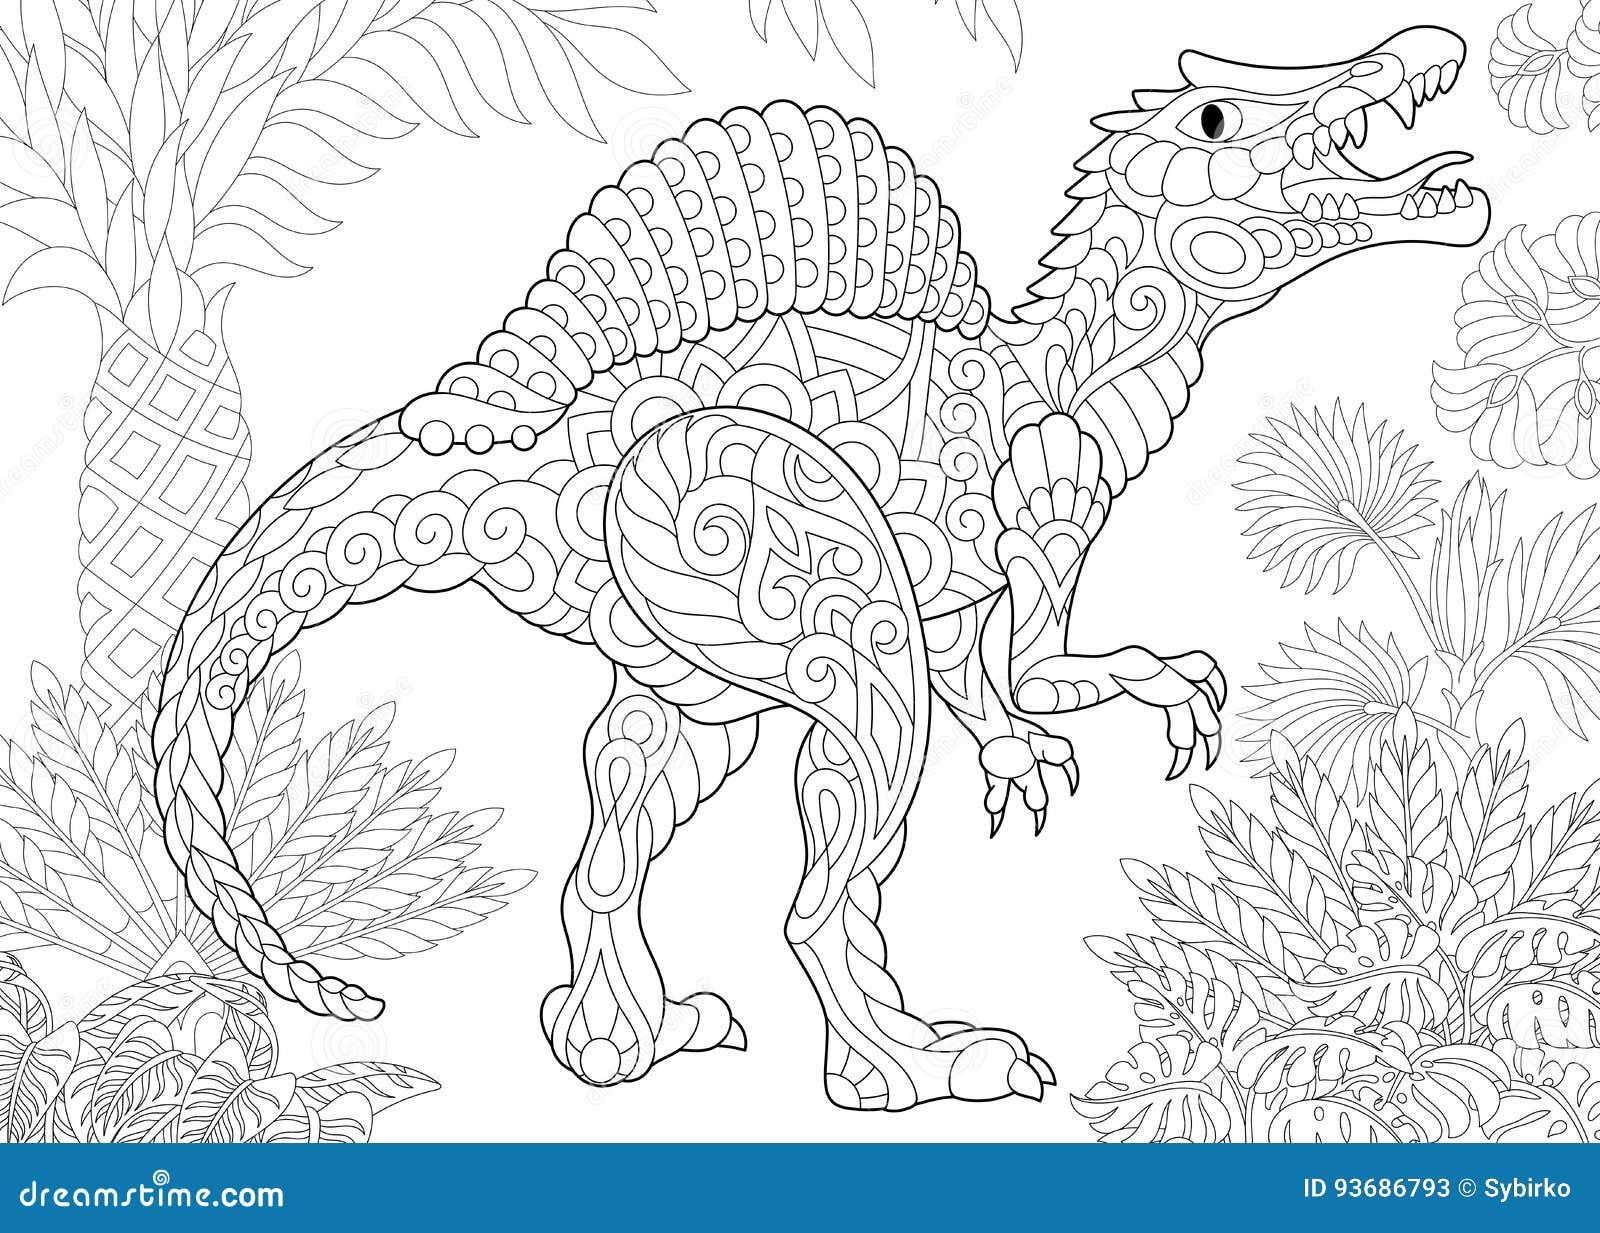 Coloriage A Imprimer Dinosaure Spinosaurus.Dinosaure De Spinosaurus De Zentangle Illustration De Vecteur